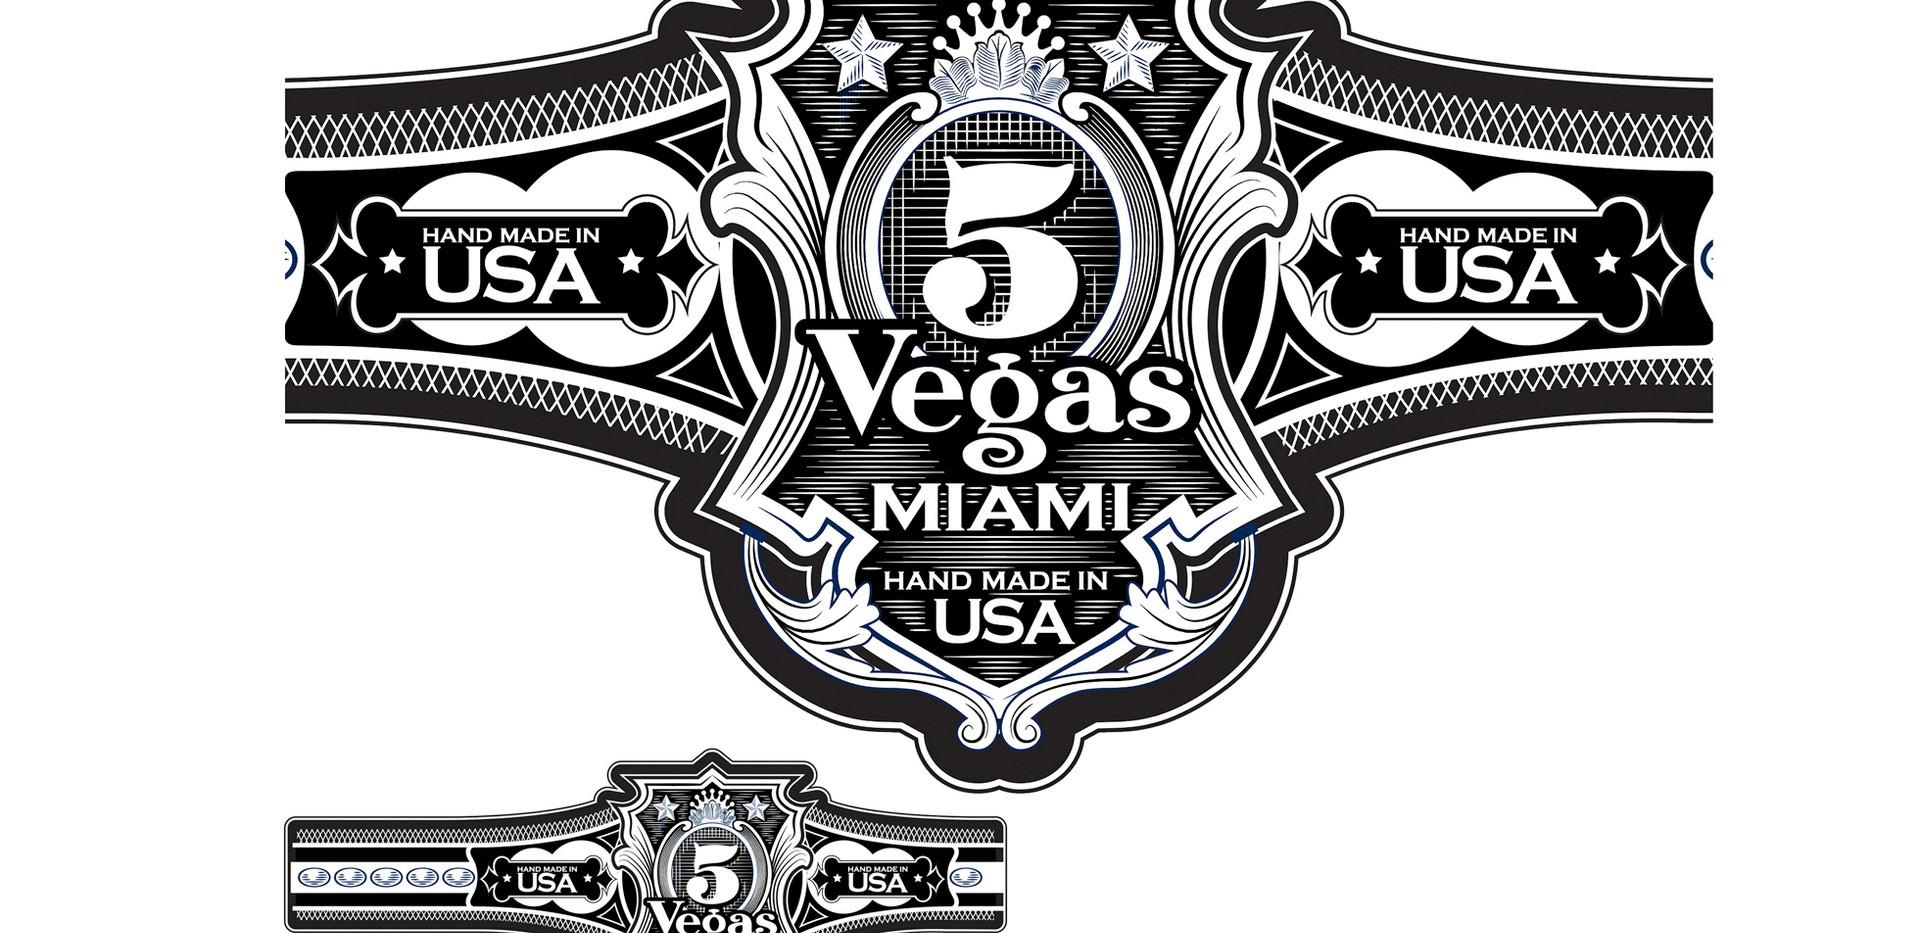 5V Miami.jpg